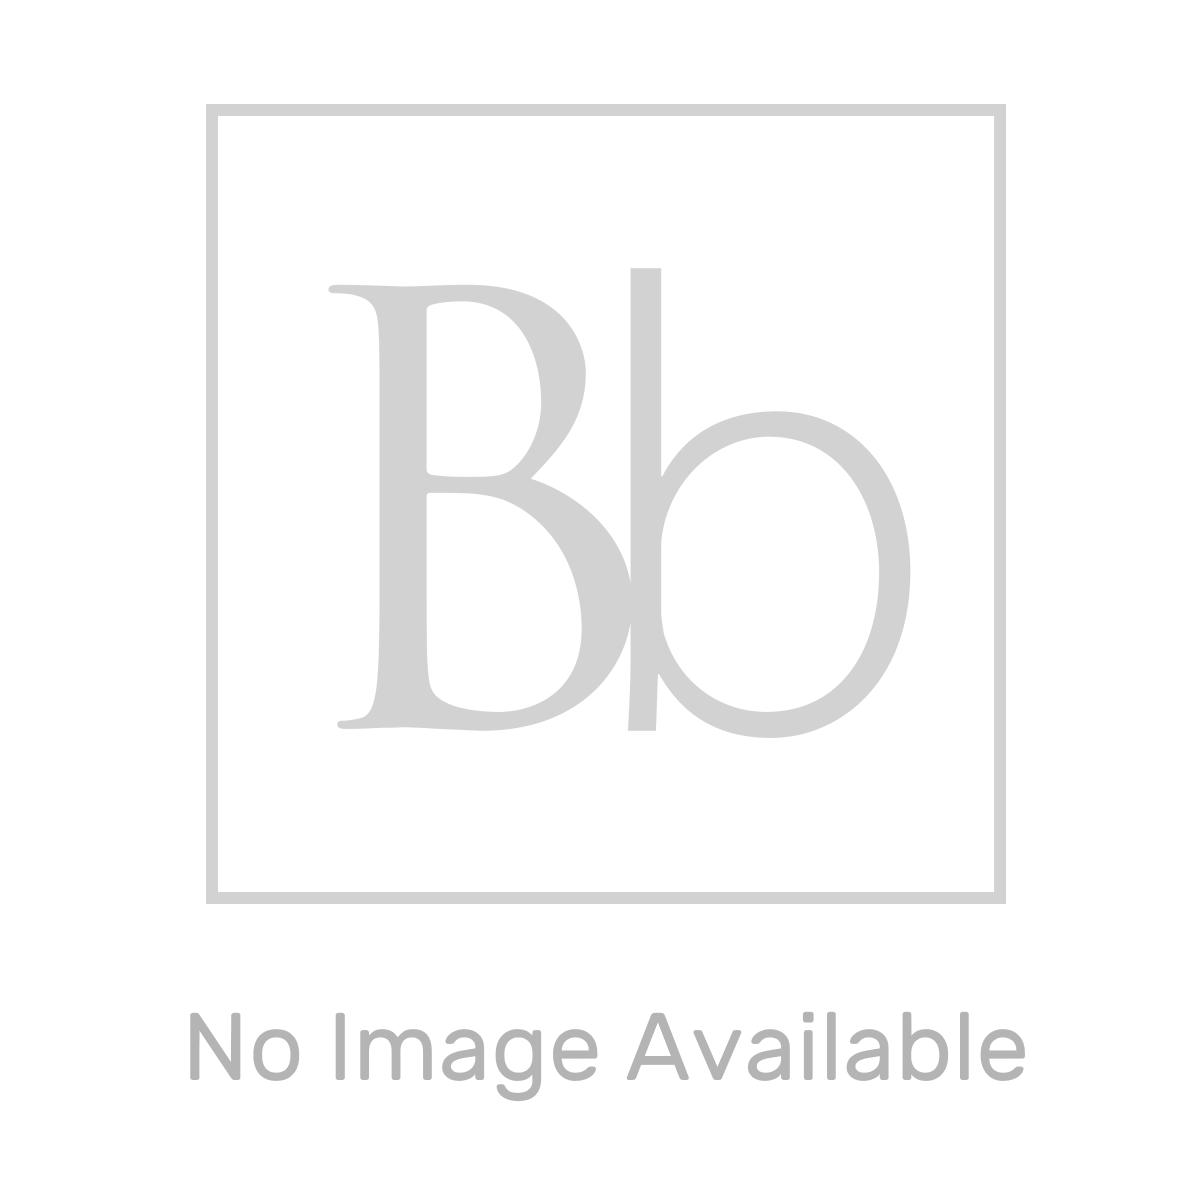 Elation Combination White Furniture Suite with April Destini Offset Quadrant Shower Enclosure